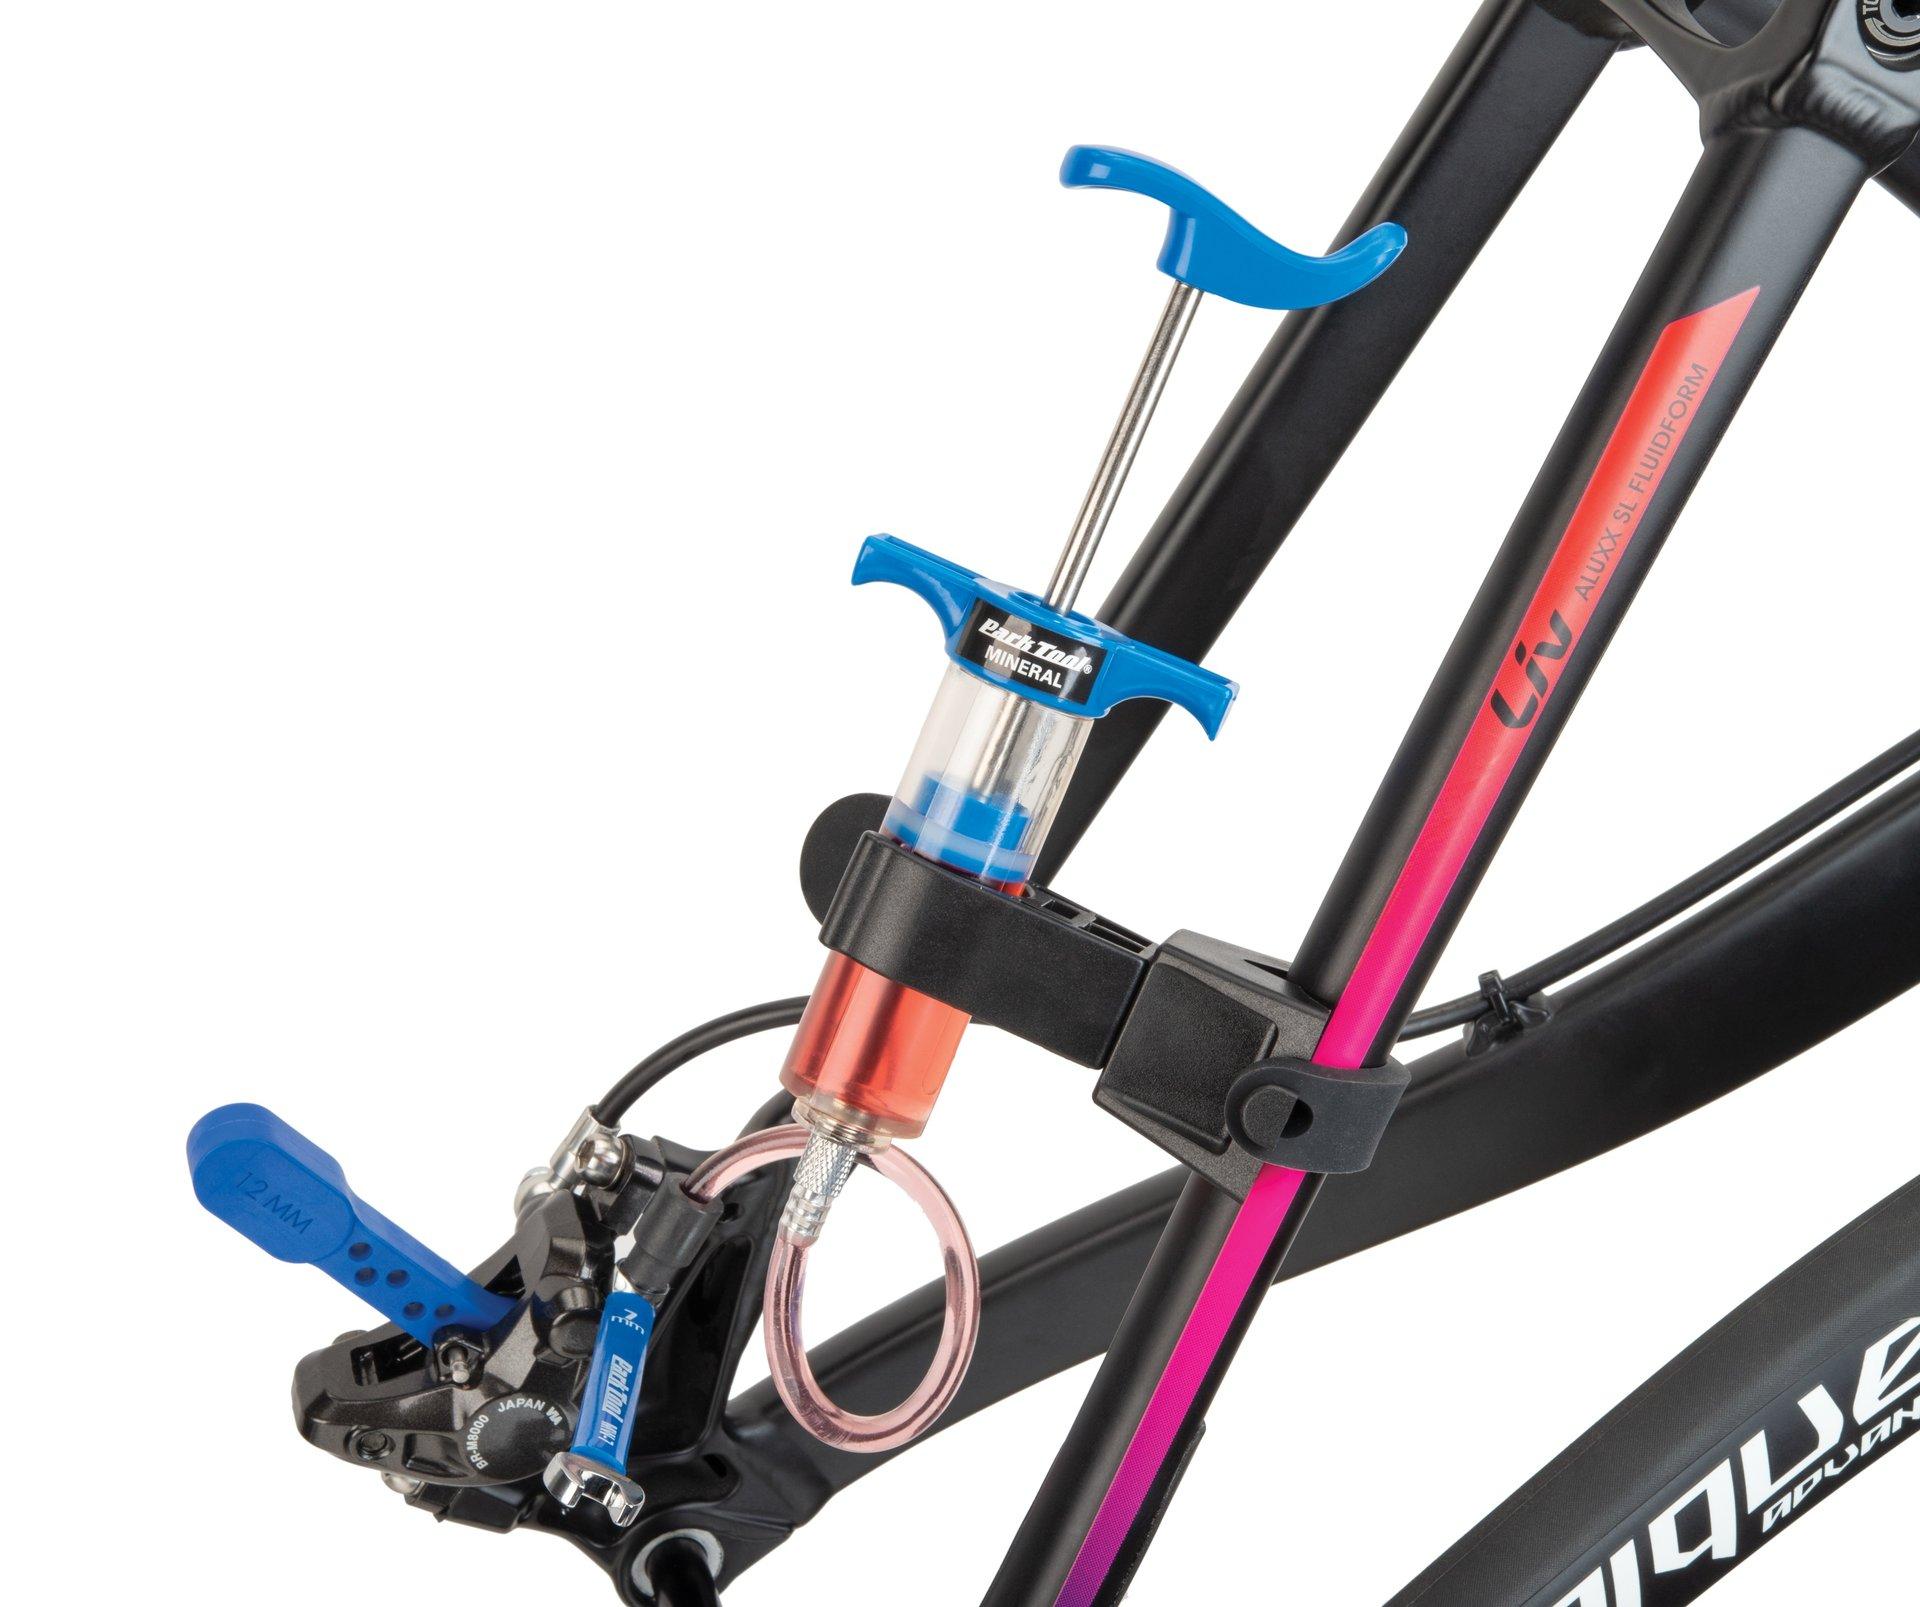 for MAGURA Bicycle Brake Bleed Kit for SRAM Series Bike Brake Repair Tools for TEKTRO Professional Bicycle Hydraulic Disc Brake Oil Mineral Bleed Kit Tool Set for Shimano